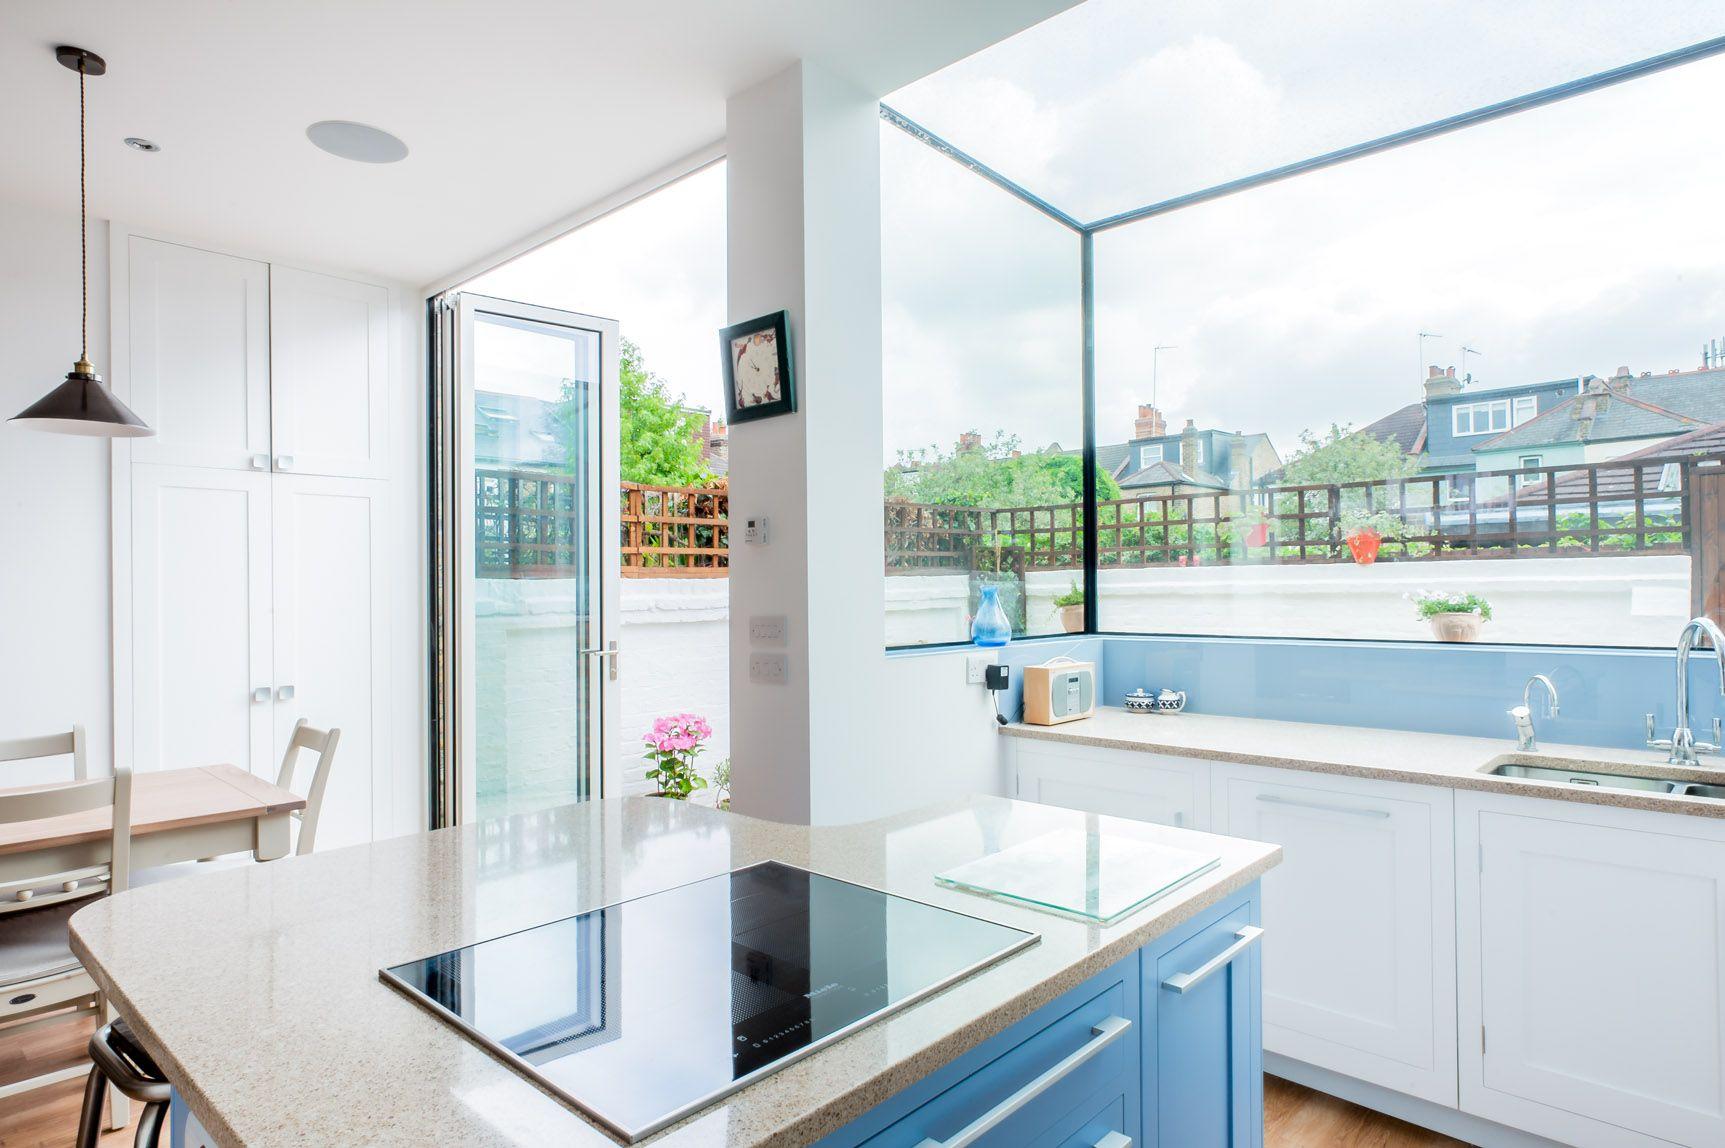 Stunning glass box kitchen extension with full height bi-fold doors ...